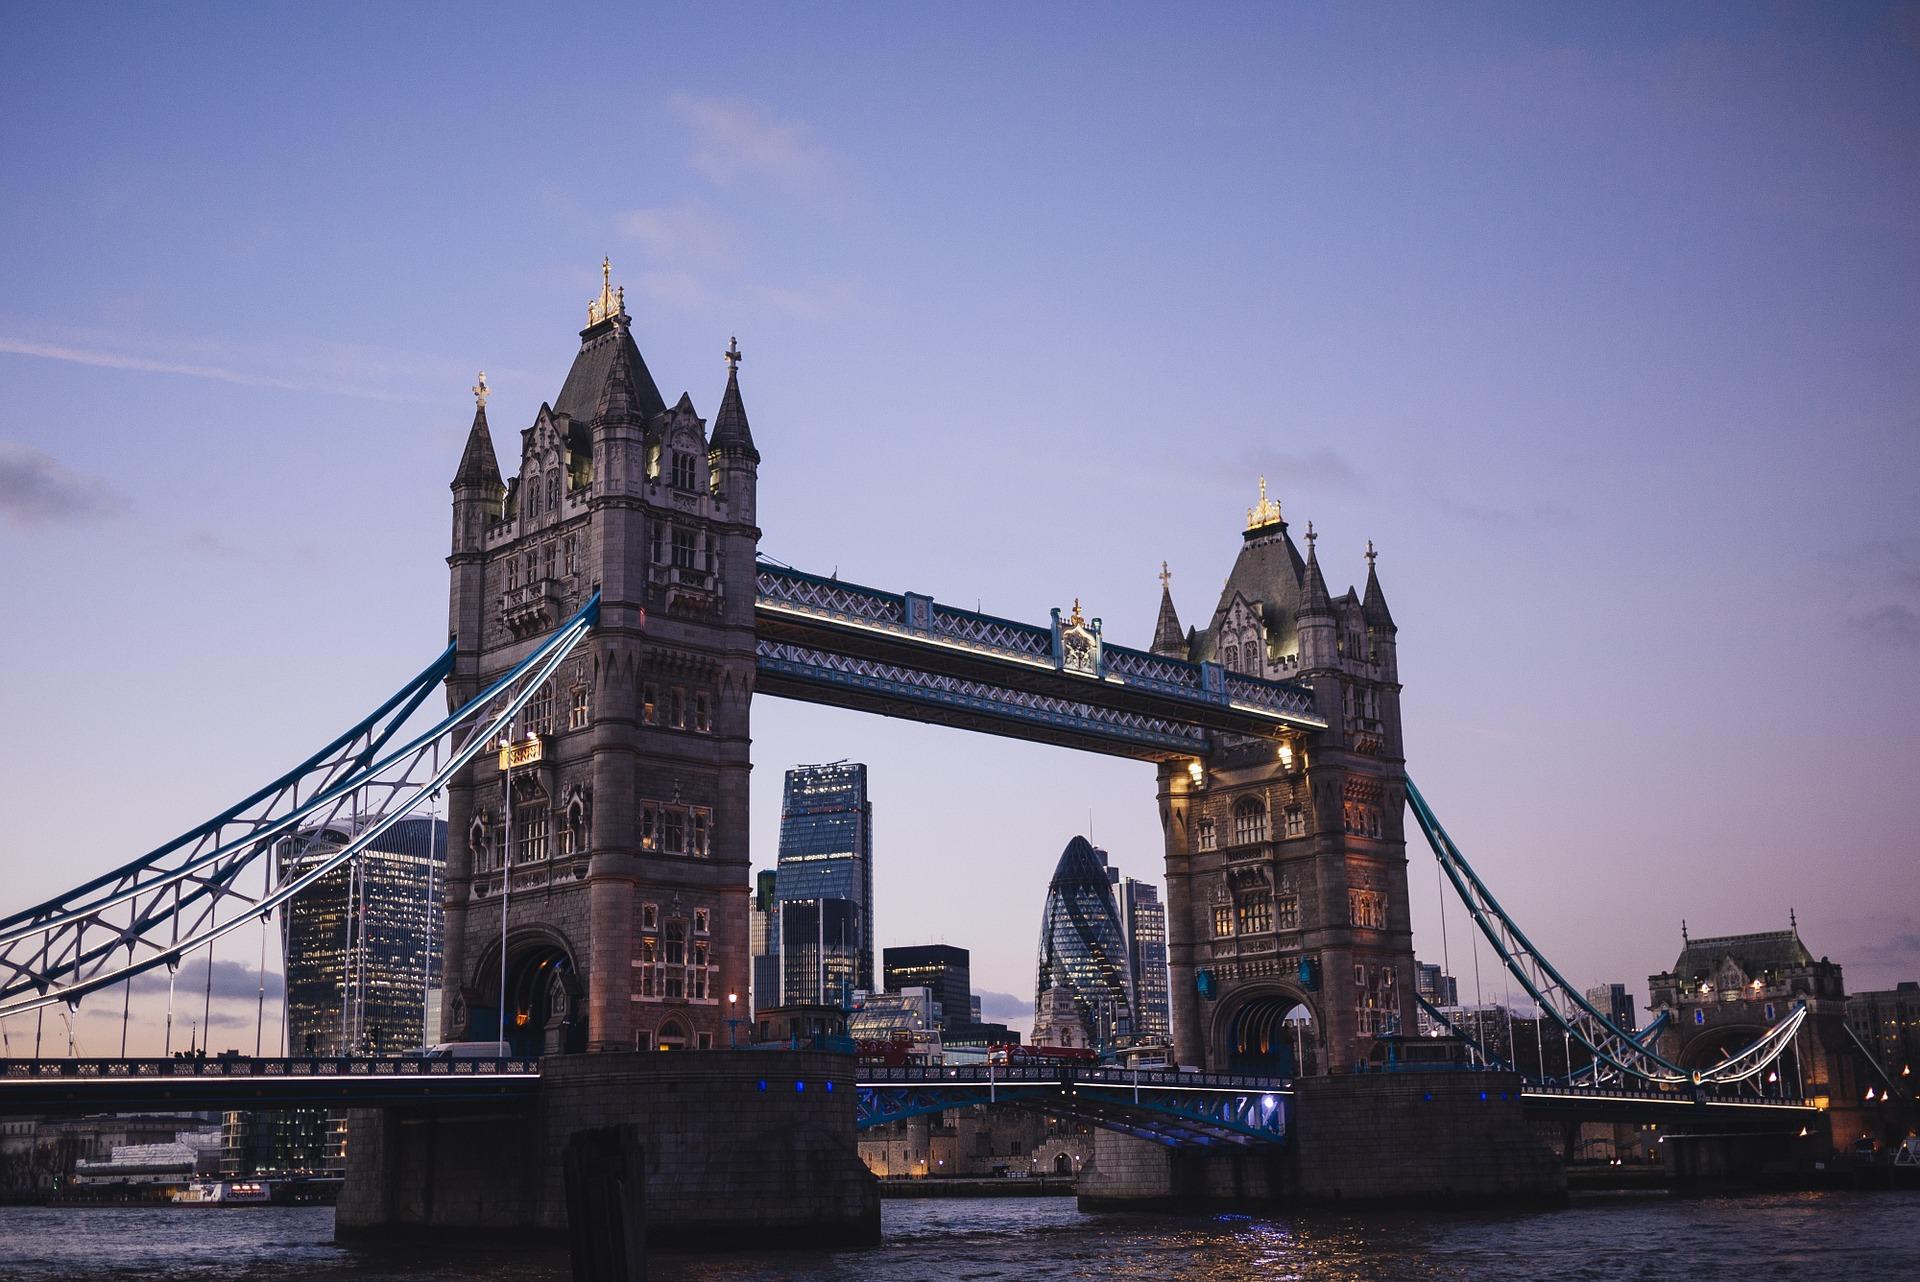 Ingiltere Şehirler - Londra tower bridge